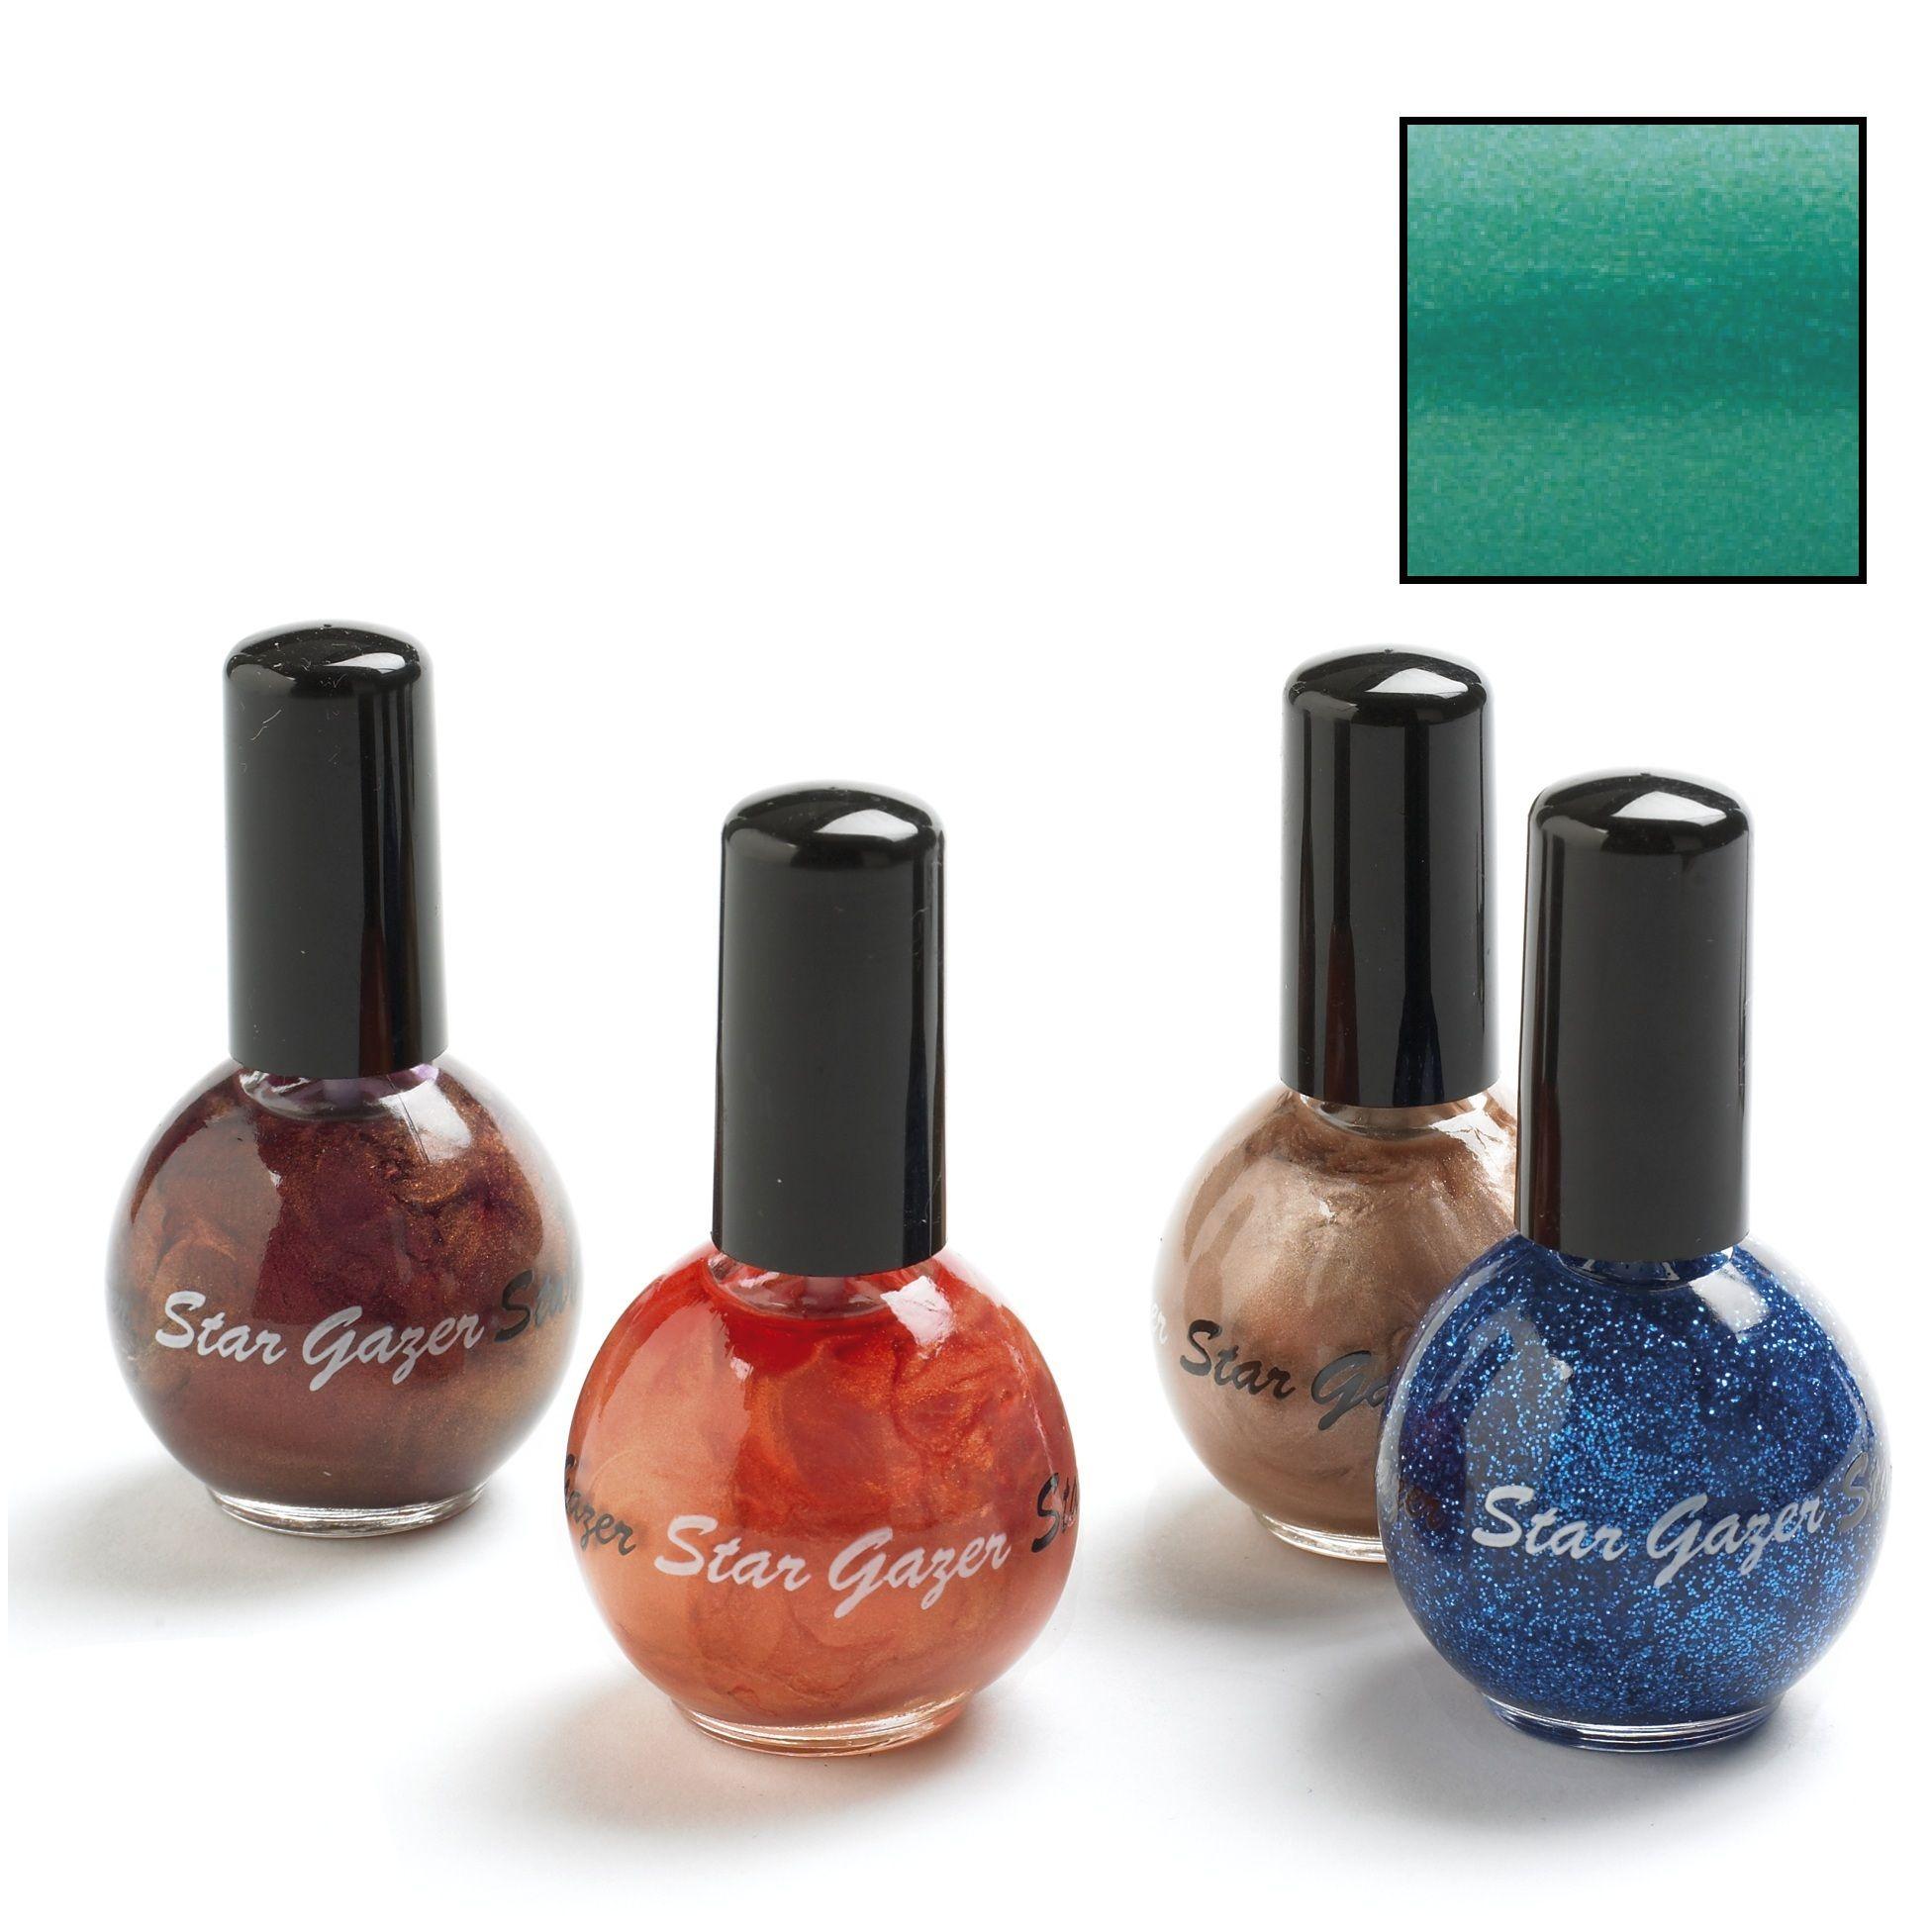 Blue Nail Varnish Uk: Pearl Turquoise Blue 154 Coloured Nail Polish Varnish